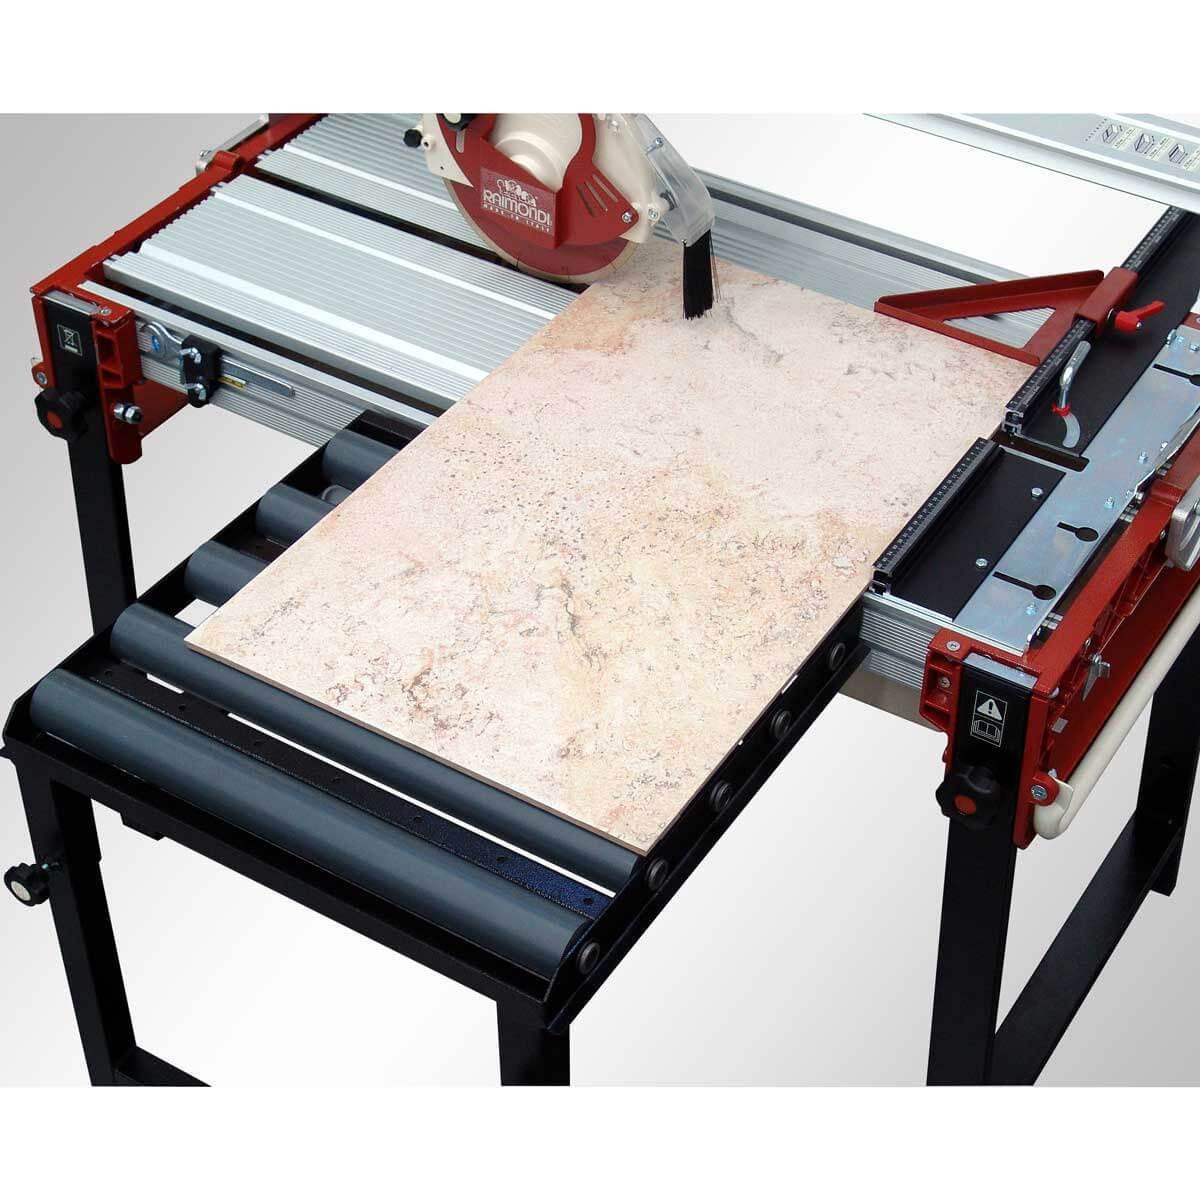 Raimondi rail saw with rolling extension table